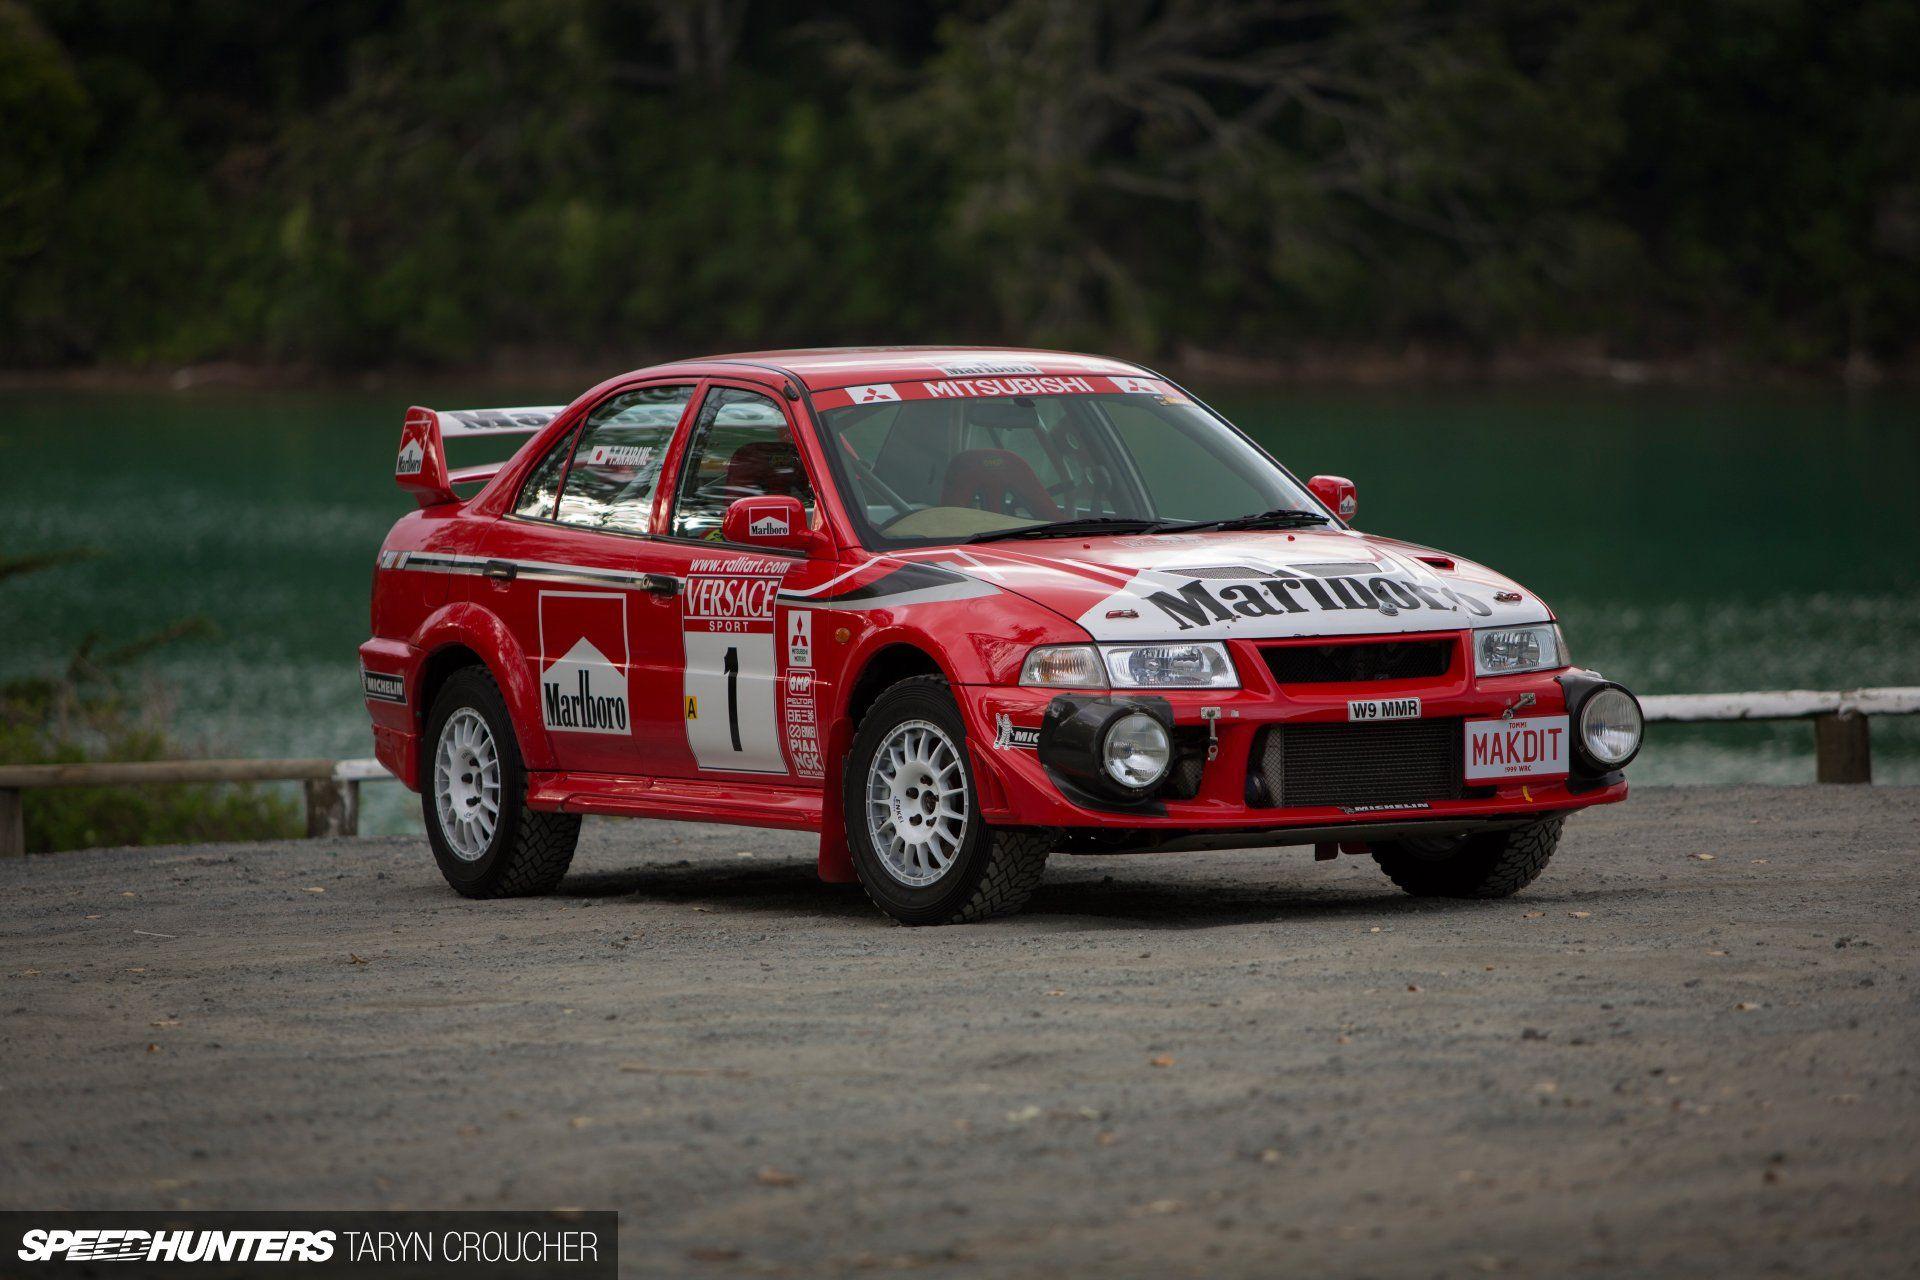 Mitsubishi Lancer Evo VI Rally Car | Classic Cars | Pinterest ...